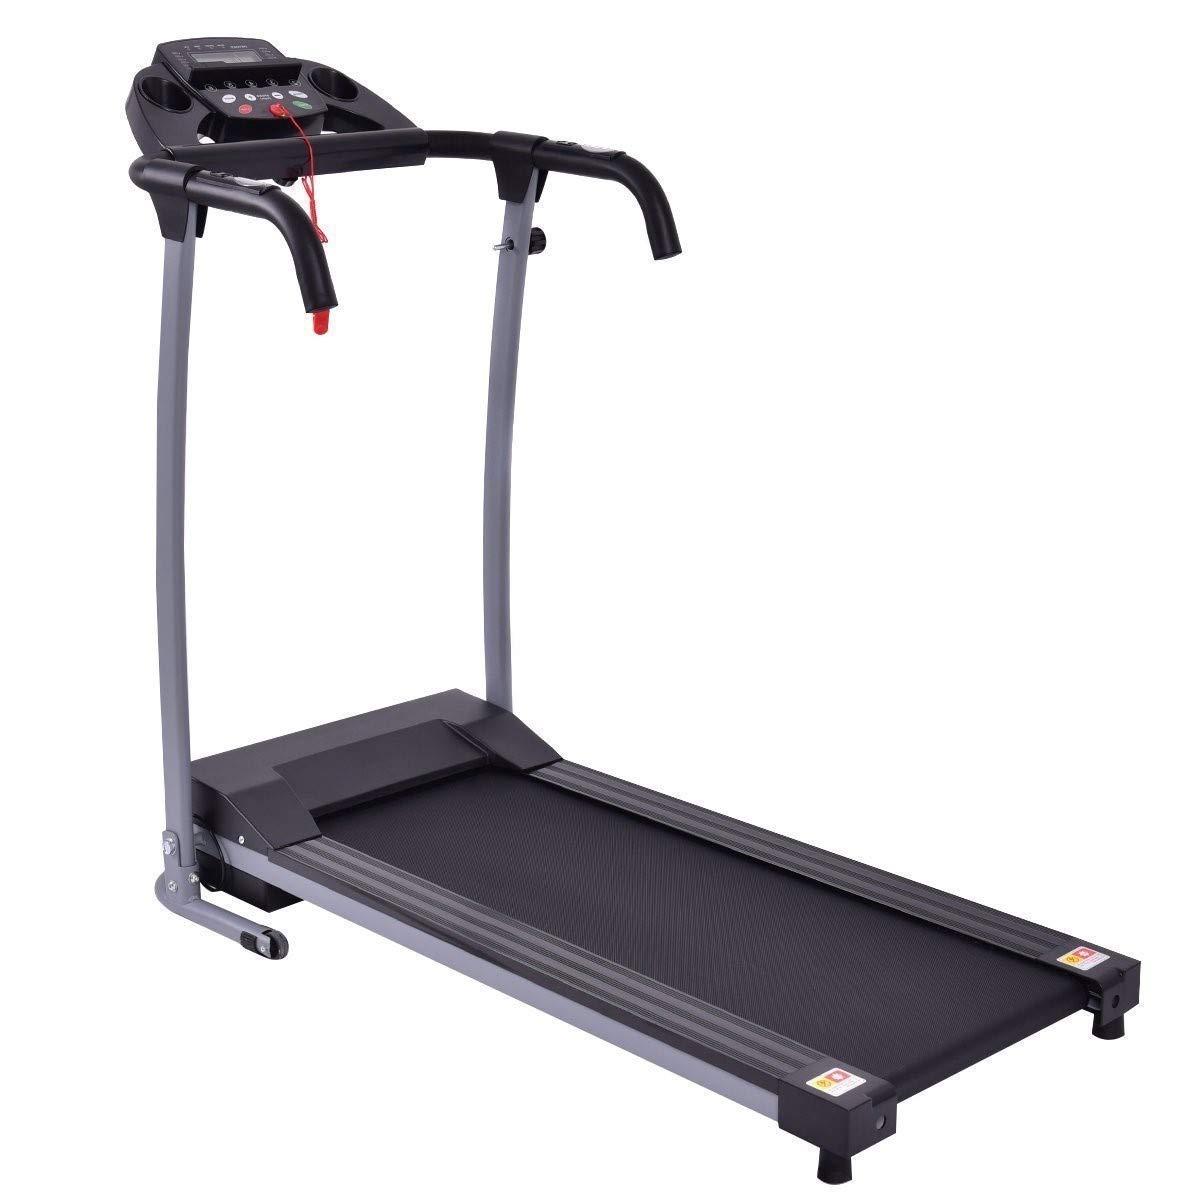 GYMAX Folding Exercise Treadmill Fitness Electric Treadmill Electric Motorized Power Fitness Running Machine 800W W/IPAD Mobile Phone Holder (Black)